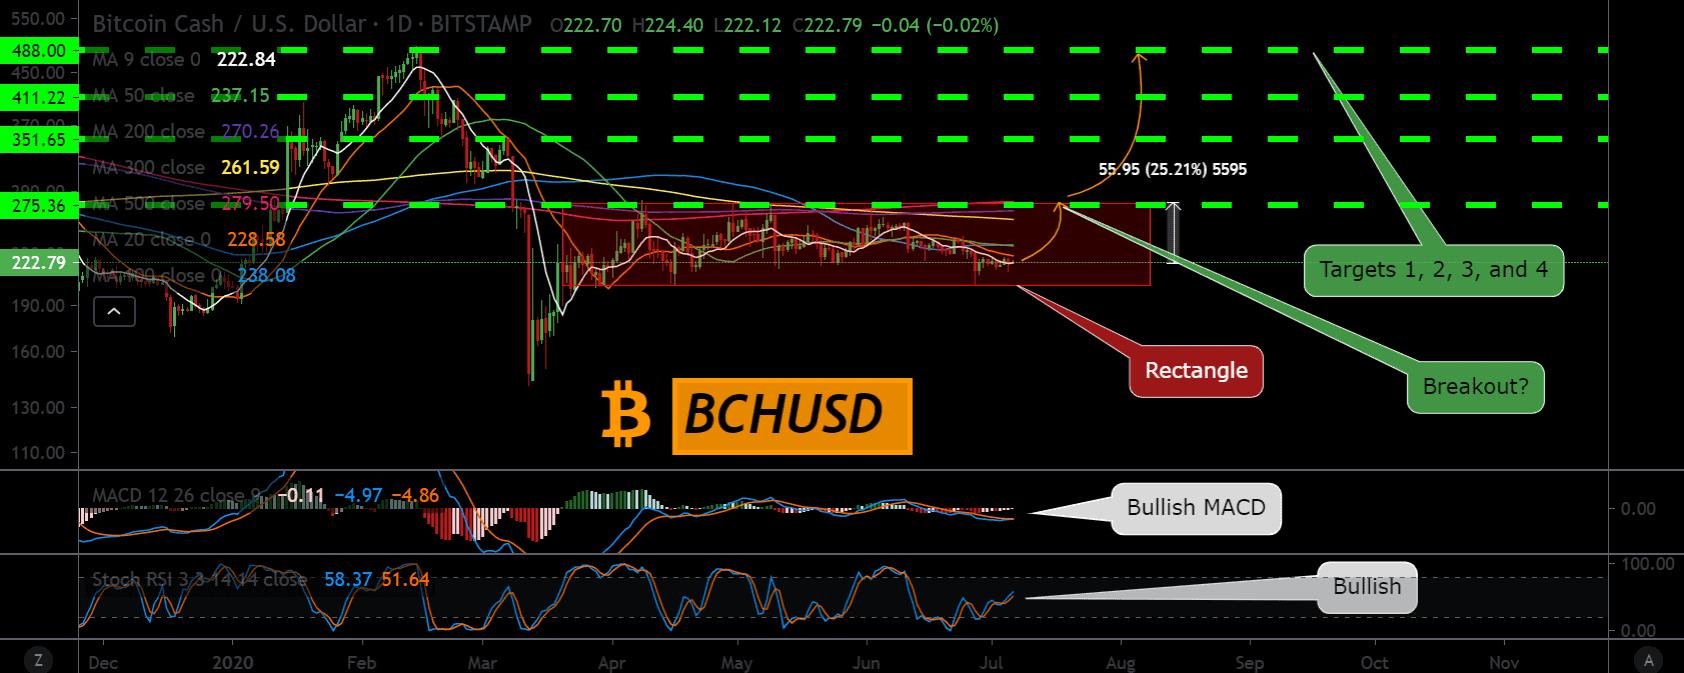 Bitcoin Cash price chart 2 - 6 July